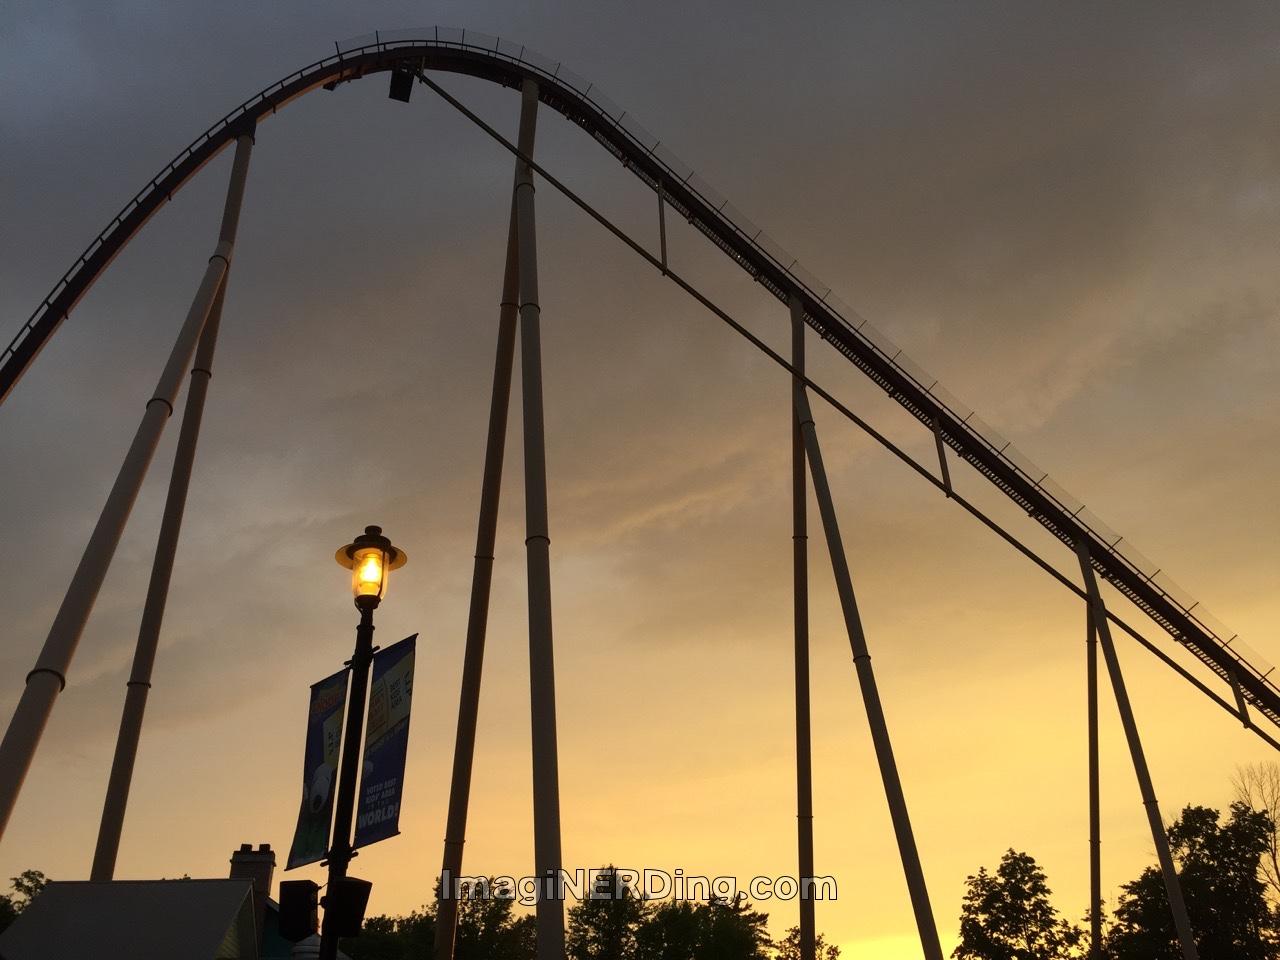 Kings Island Roller Coasters - ImagiNERDing